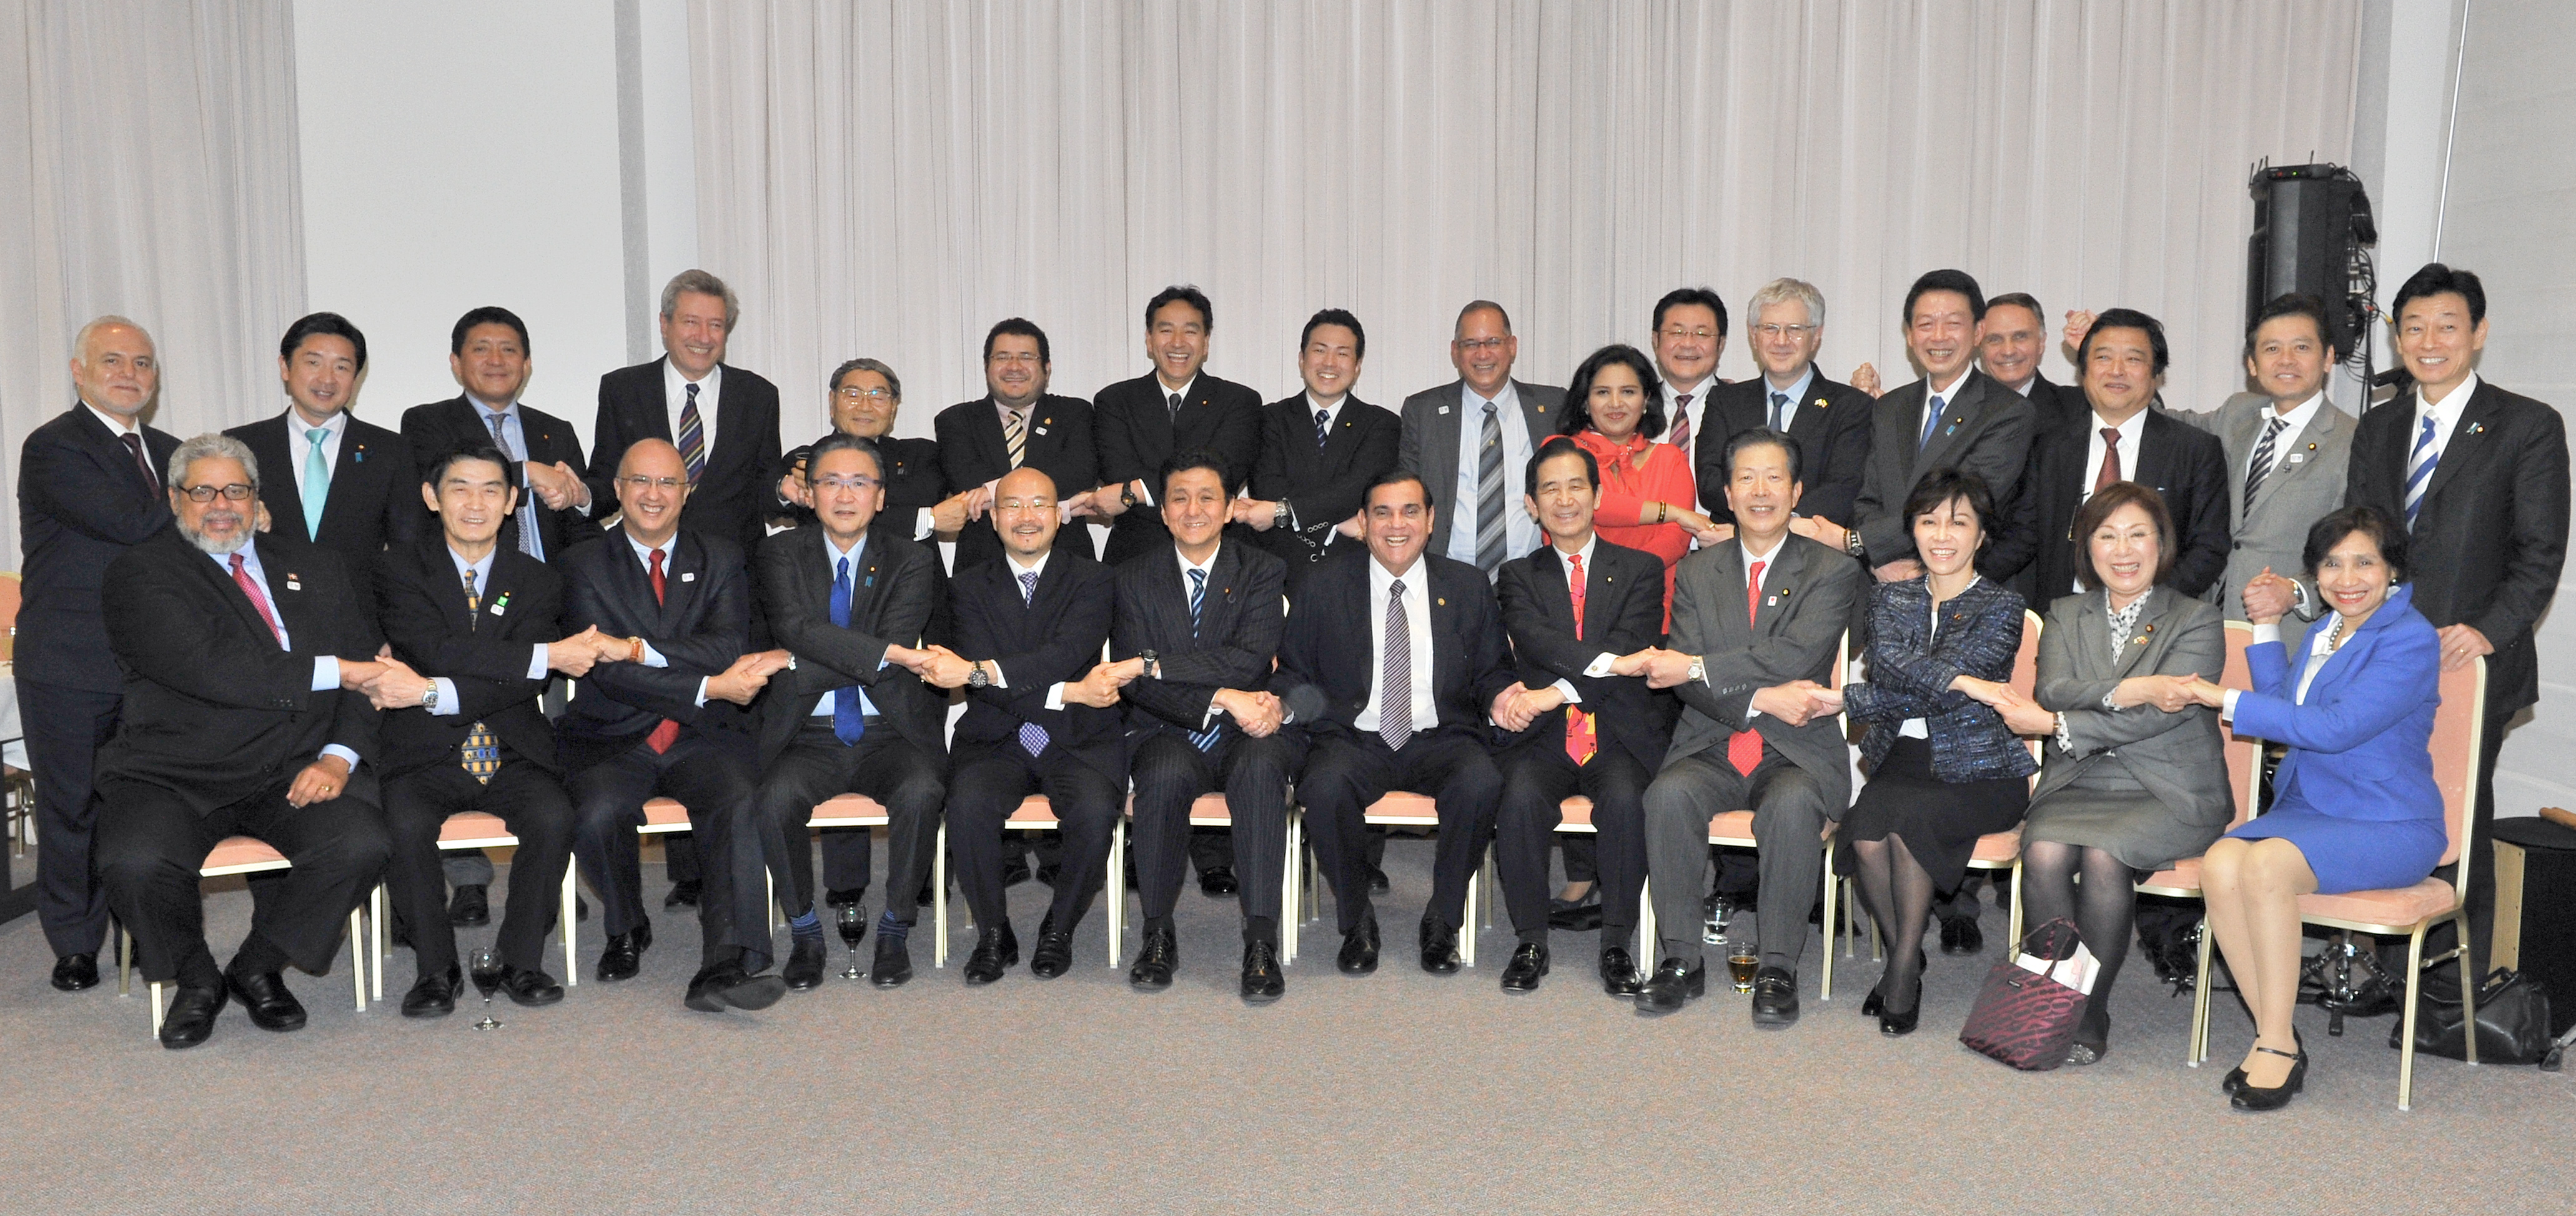 Ambassadors and the parliamentarians